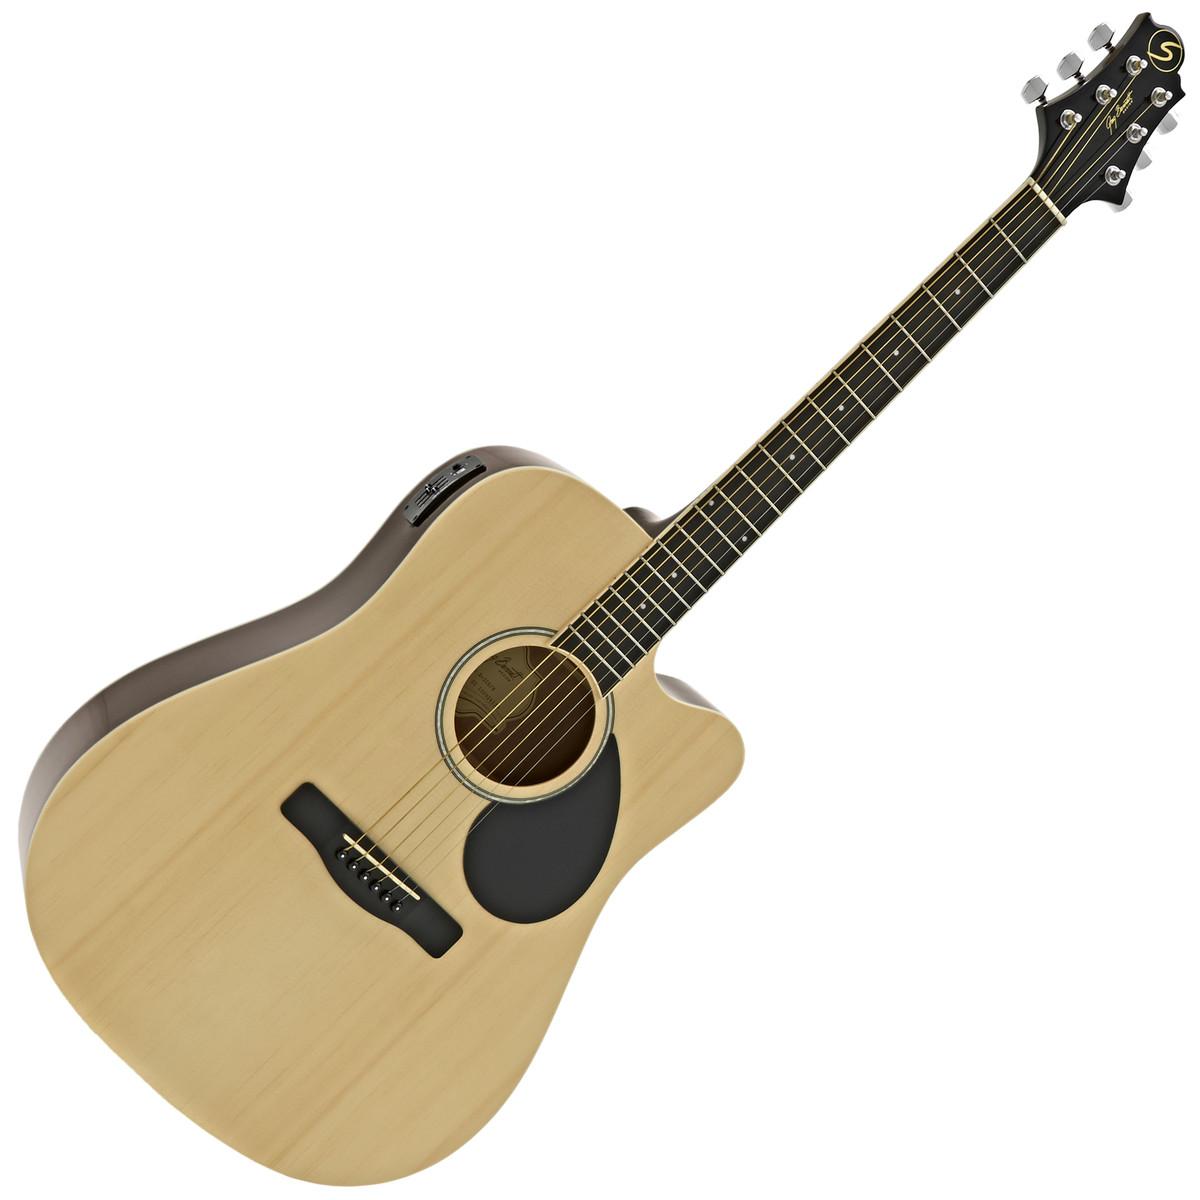 Image of Greg Bennett D-2CE Electro Acoustic Guitar Natural